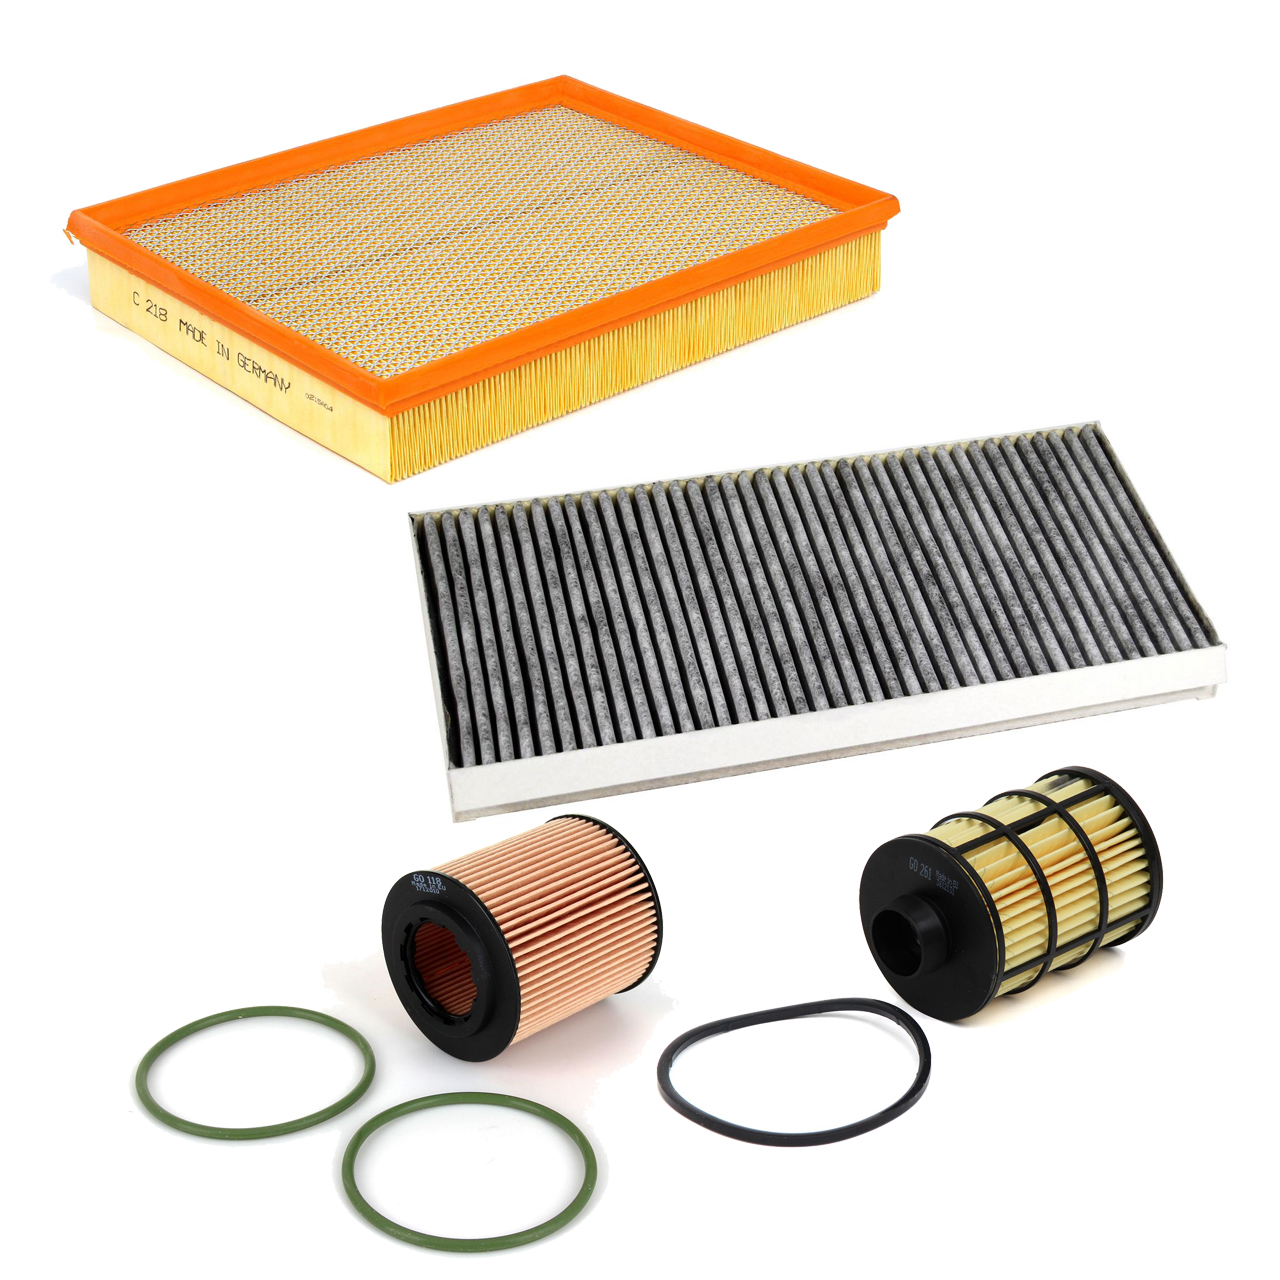 Inspektionskit Filterpaket Filterset für Fiat Croma Opel Signum Vectra C 1.9CDTI